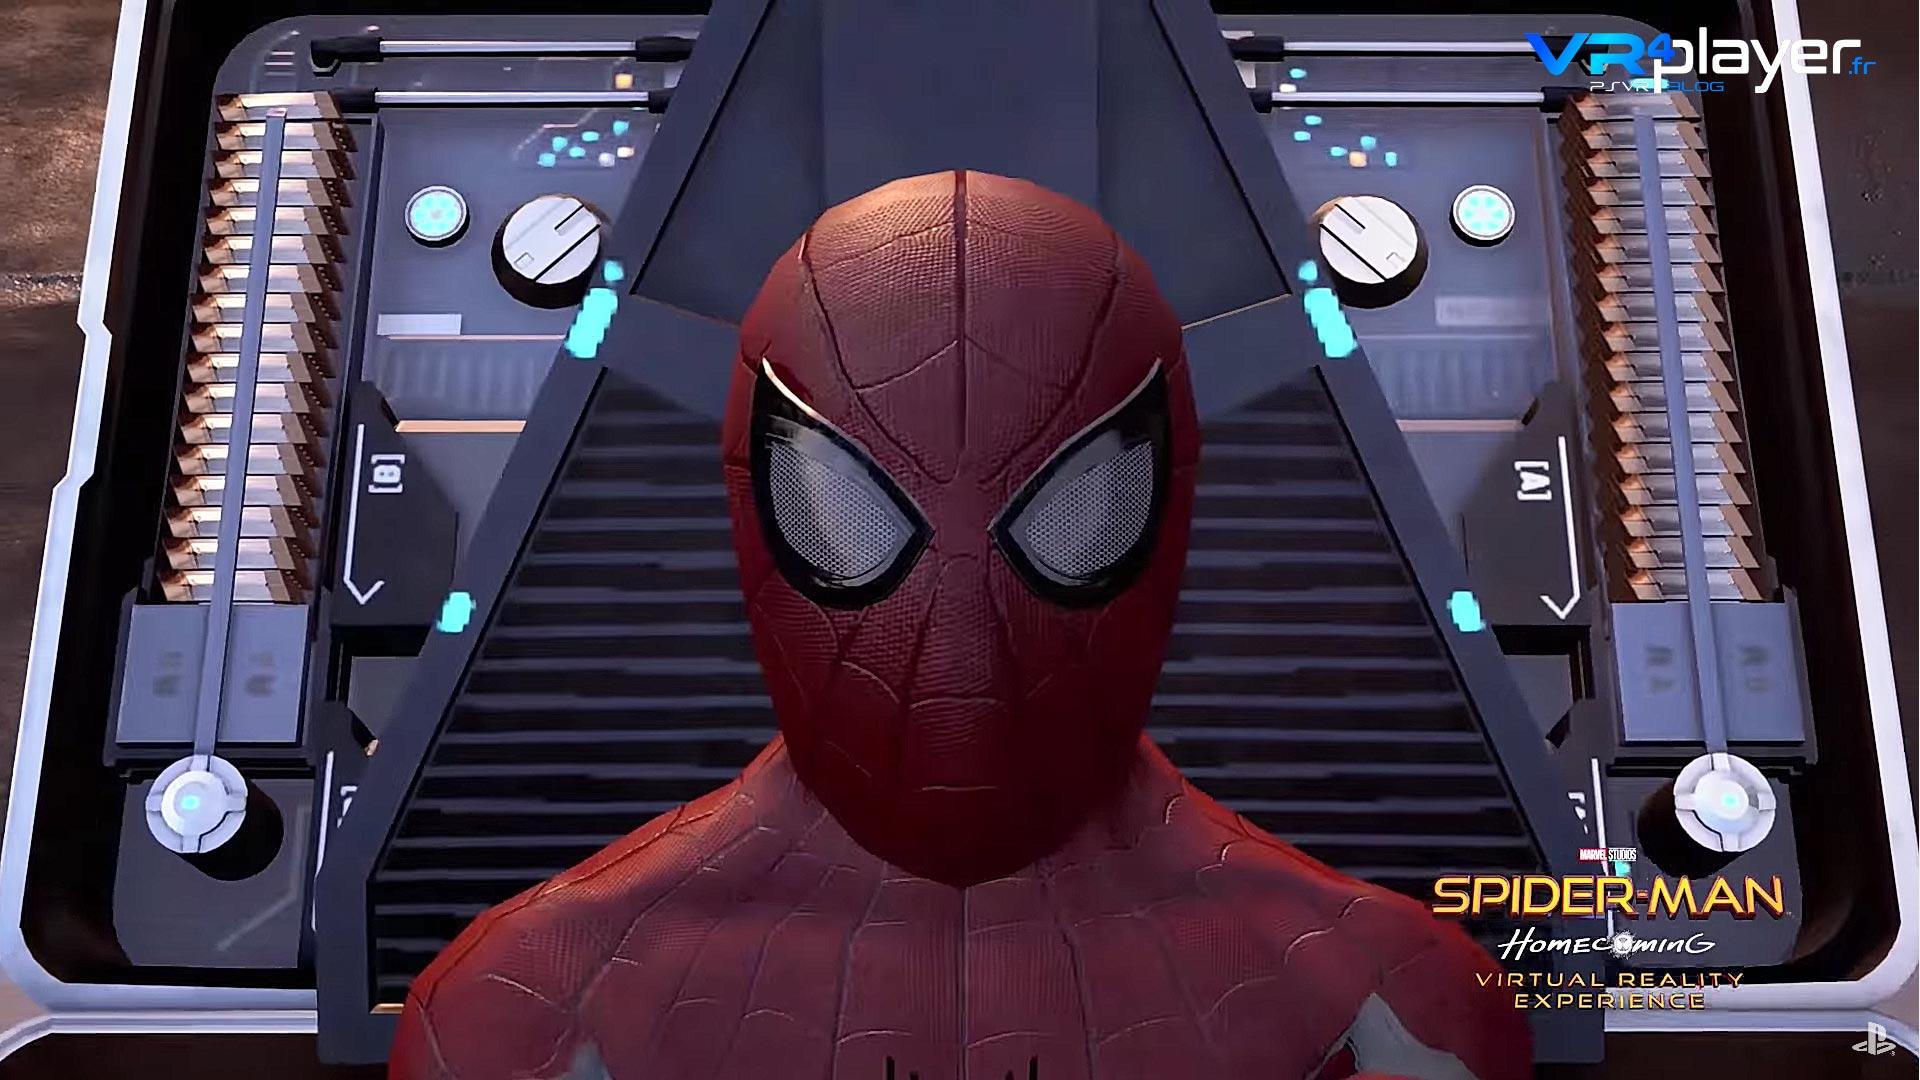 Spiderman Homecoming VR PSVR - VR4Player